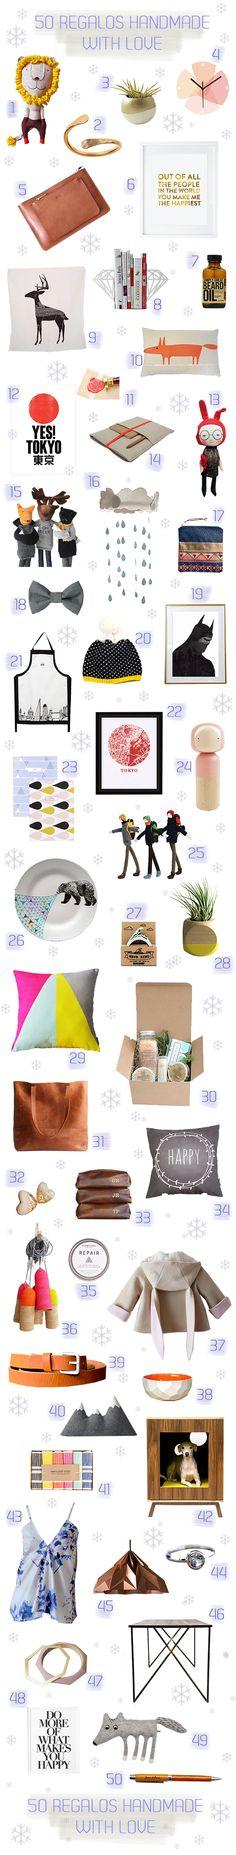 Christmas Shopping List - 2become1 Design  http://2become1studio.blogspot.com.es/2014/12/un-papa-noel-original-y-artesano.html